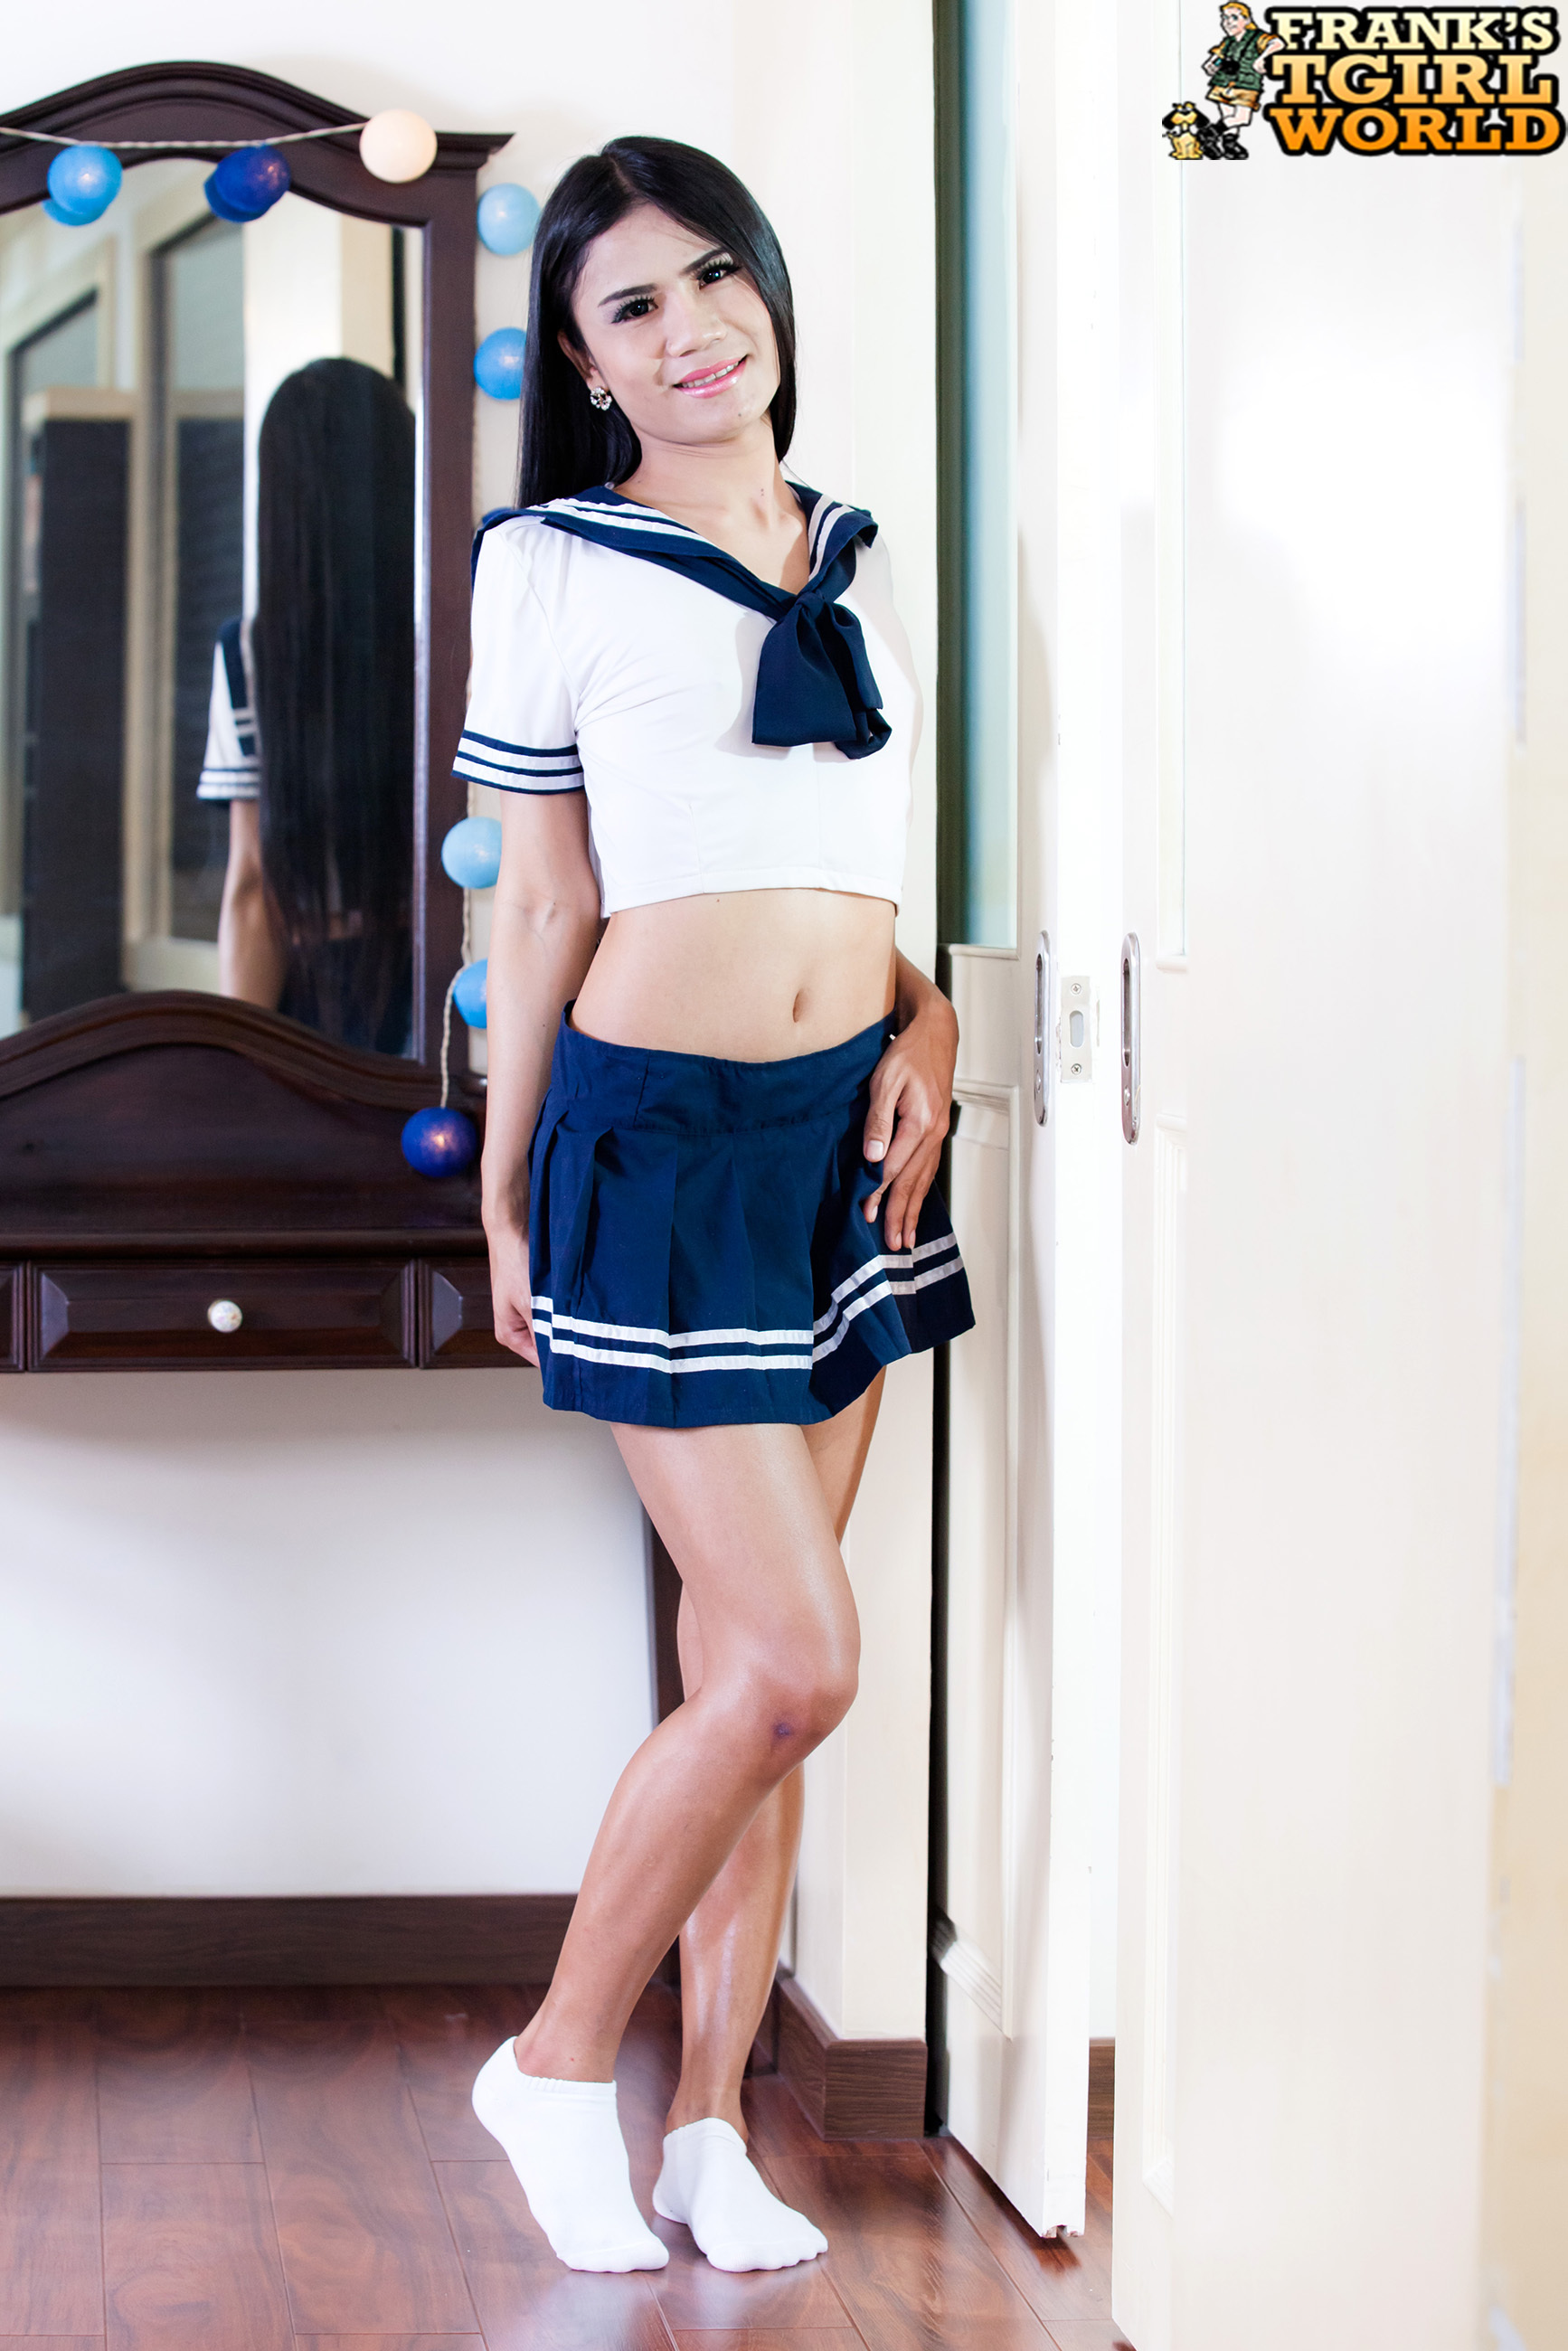 Naughty School Girl Nancy Plays!